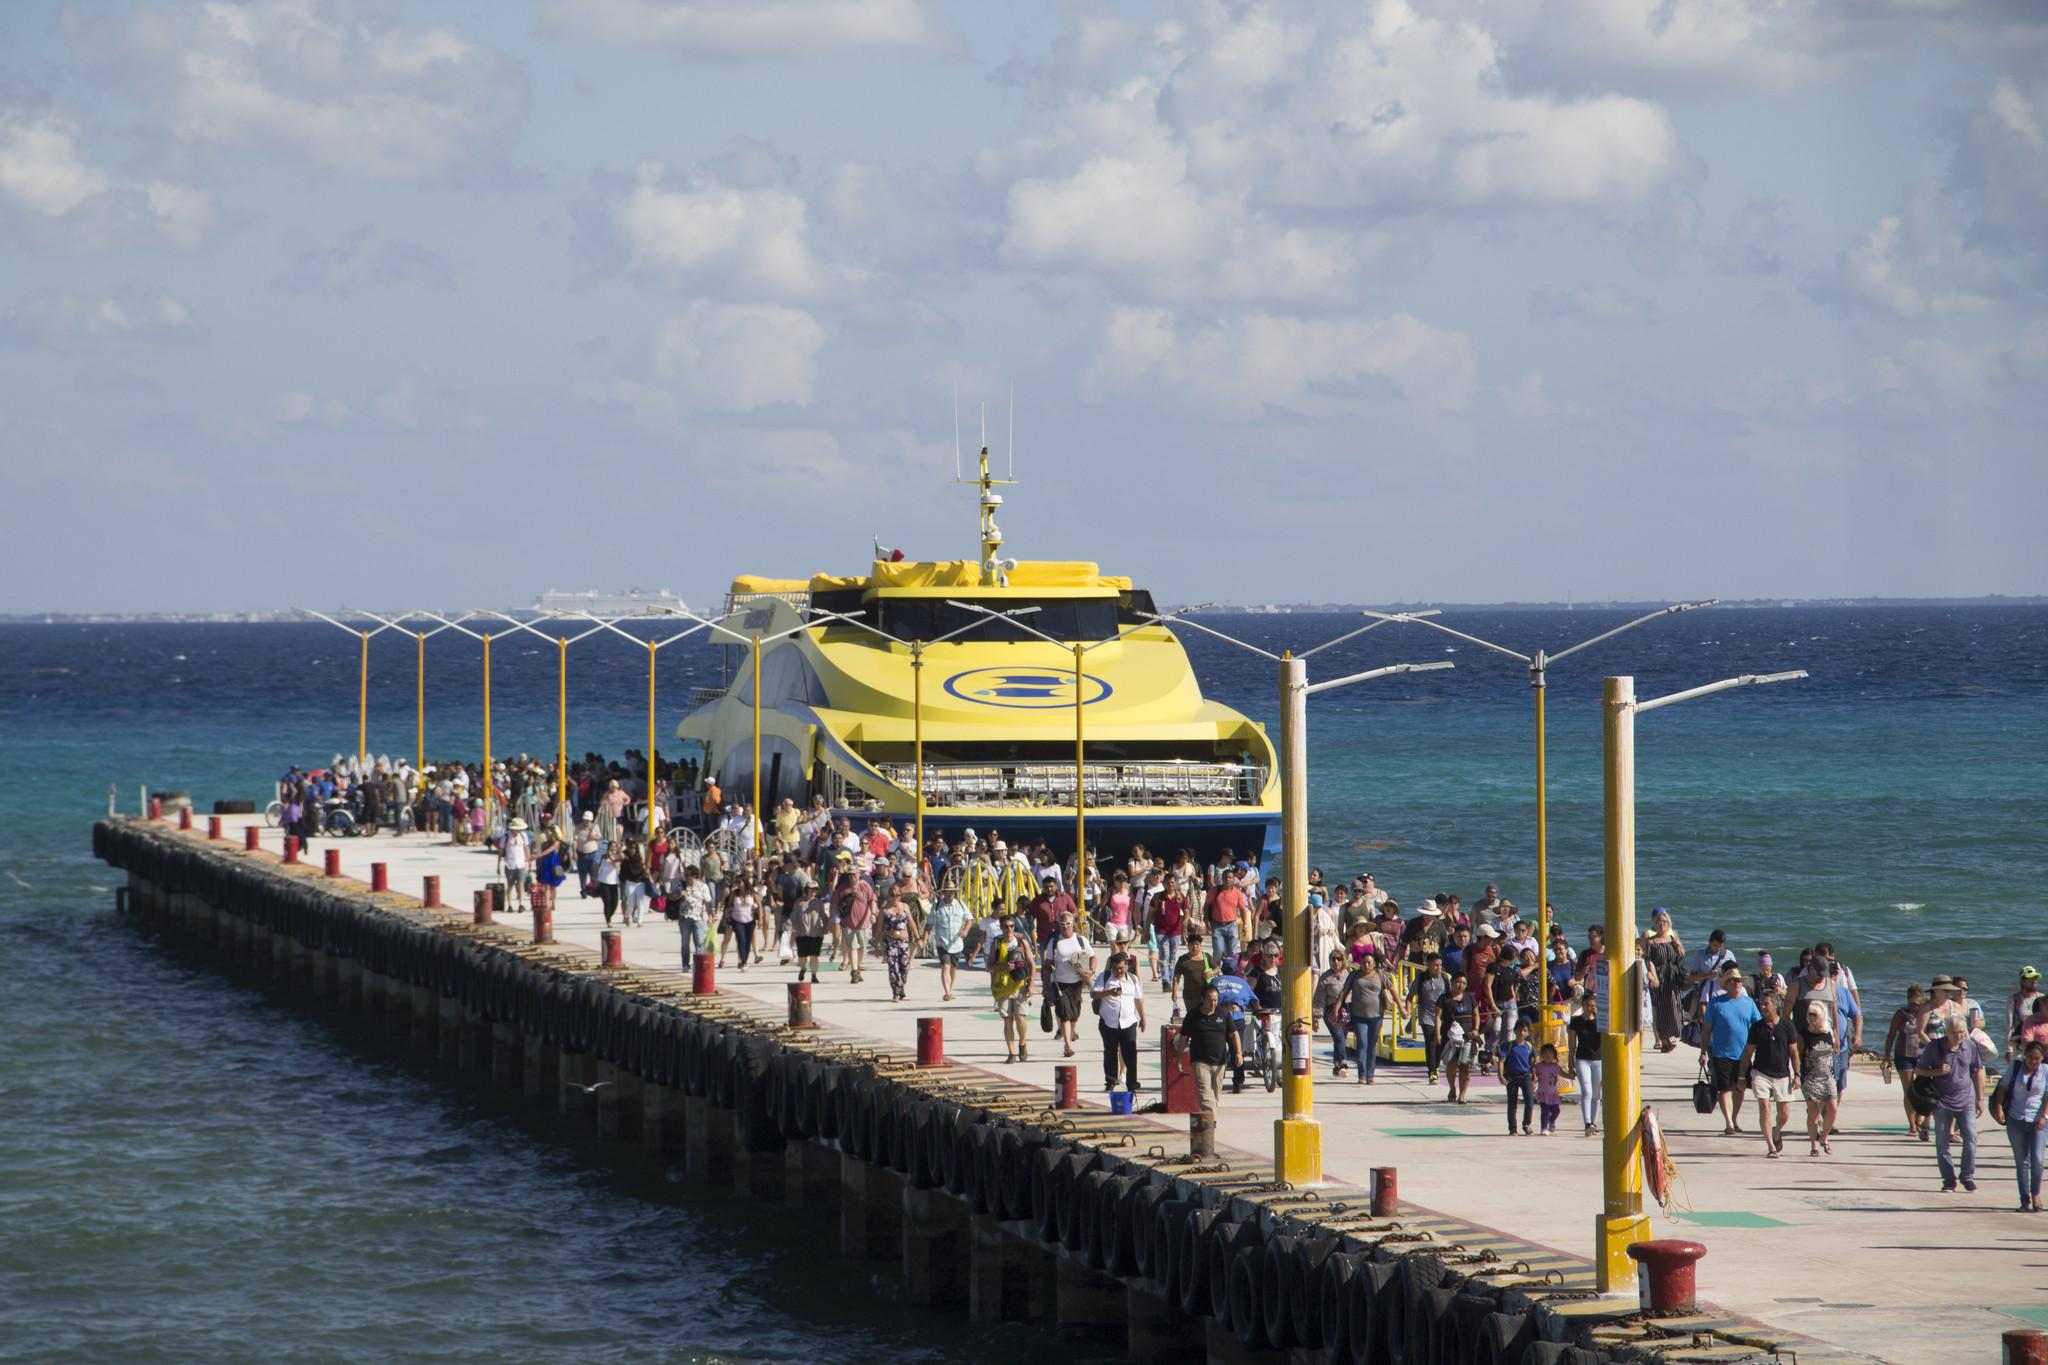 Mexico says Playa del Carmen safe despite U.S. travel alert